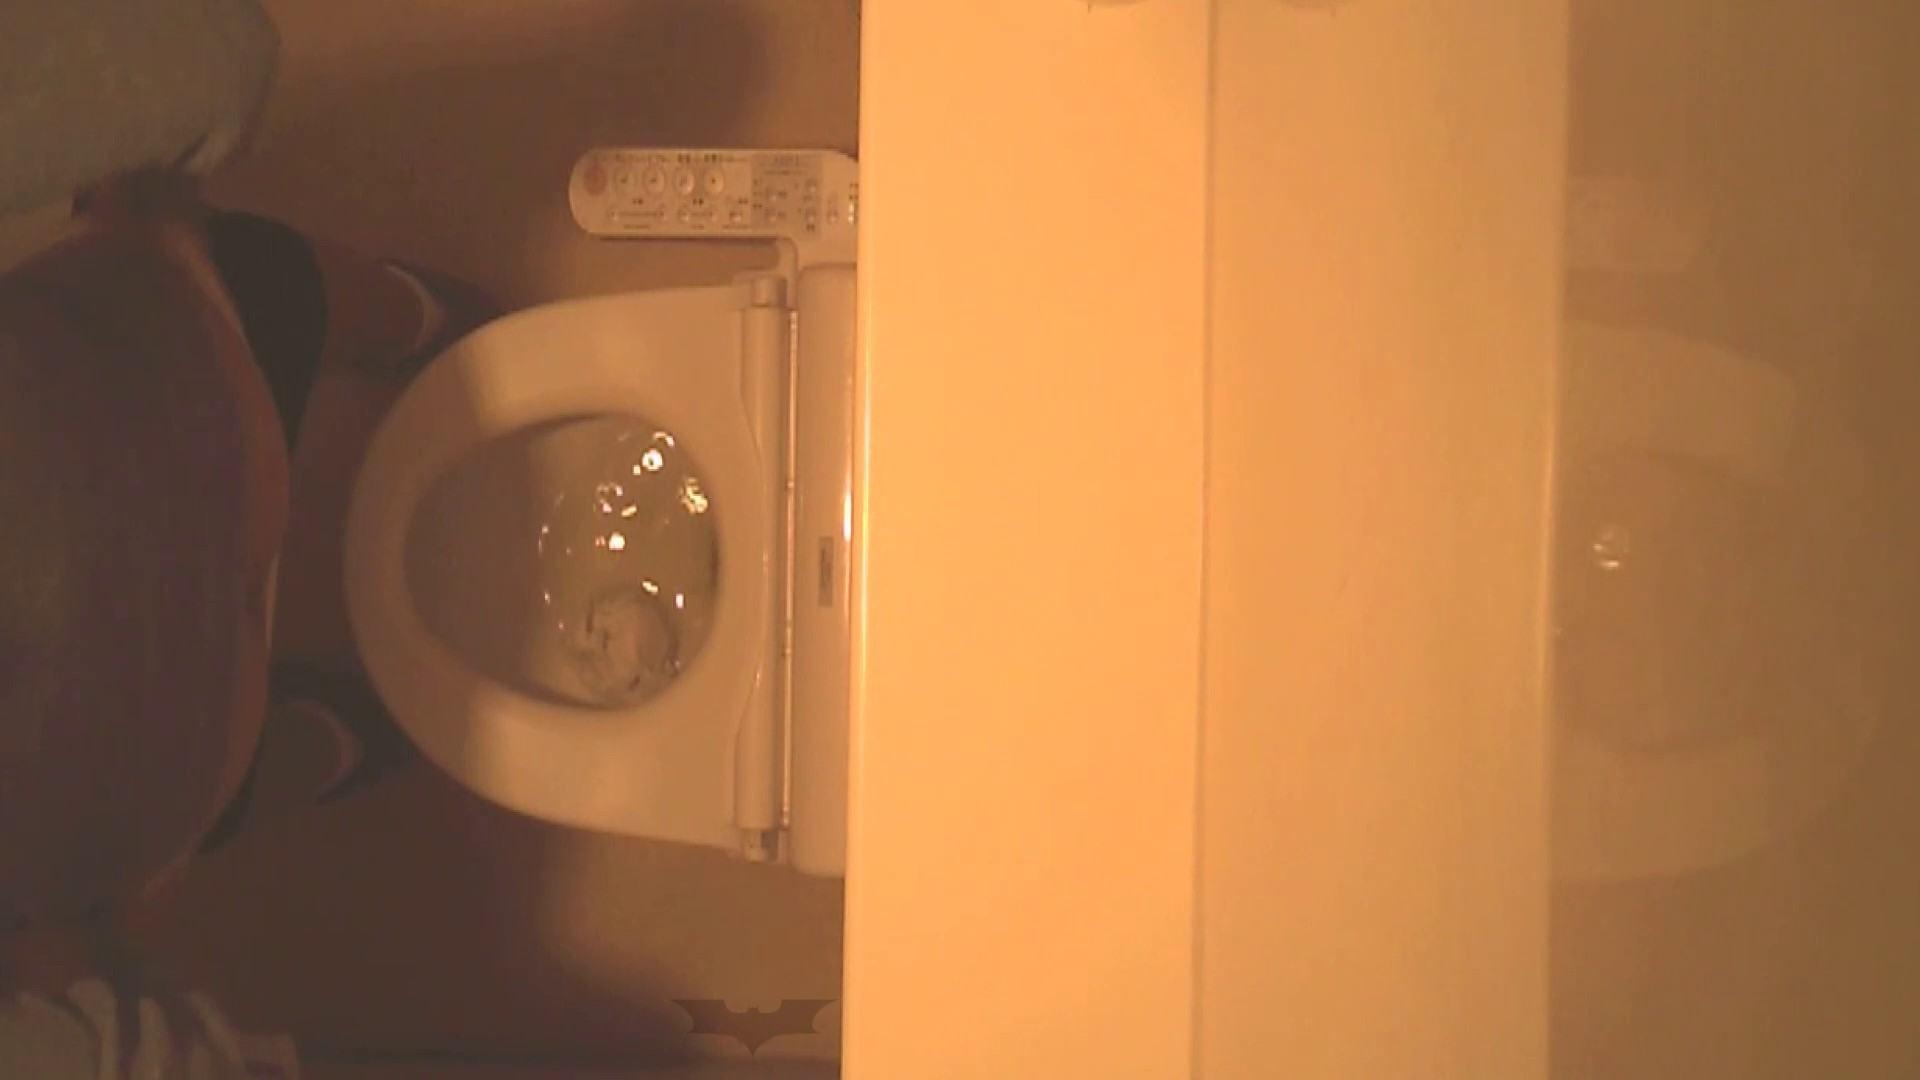 潜入!!全国女子洗面所盗撮 Vol.07 グループ エロ無料画像 80PIX 59